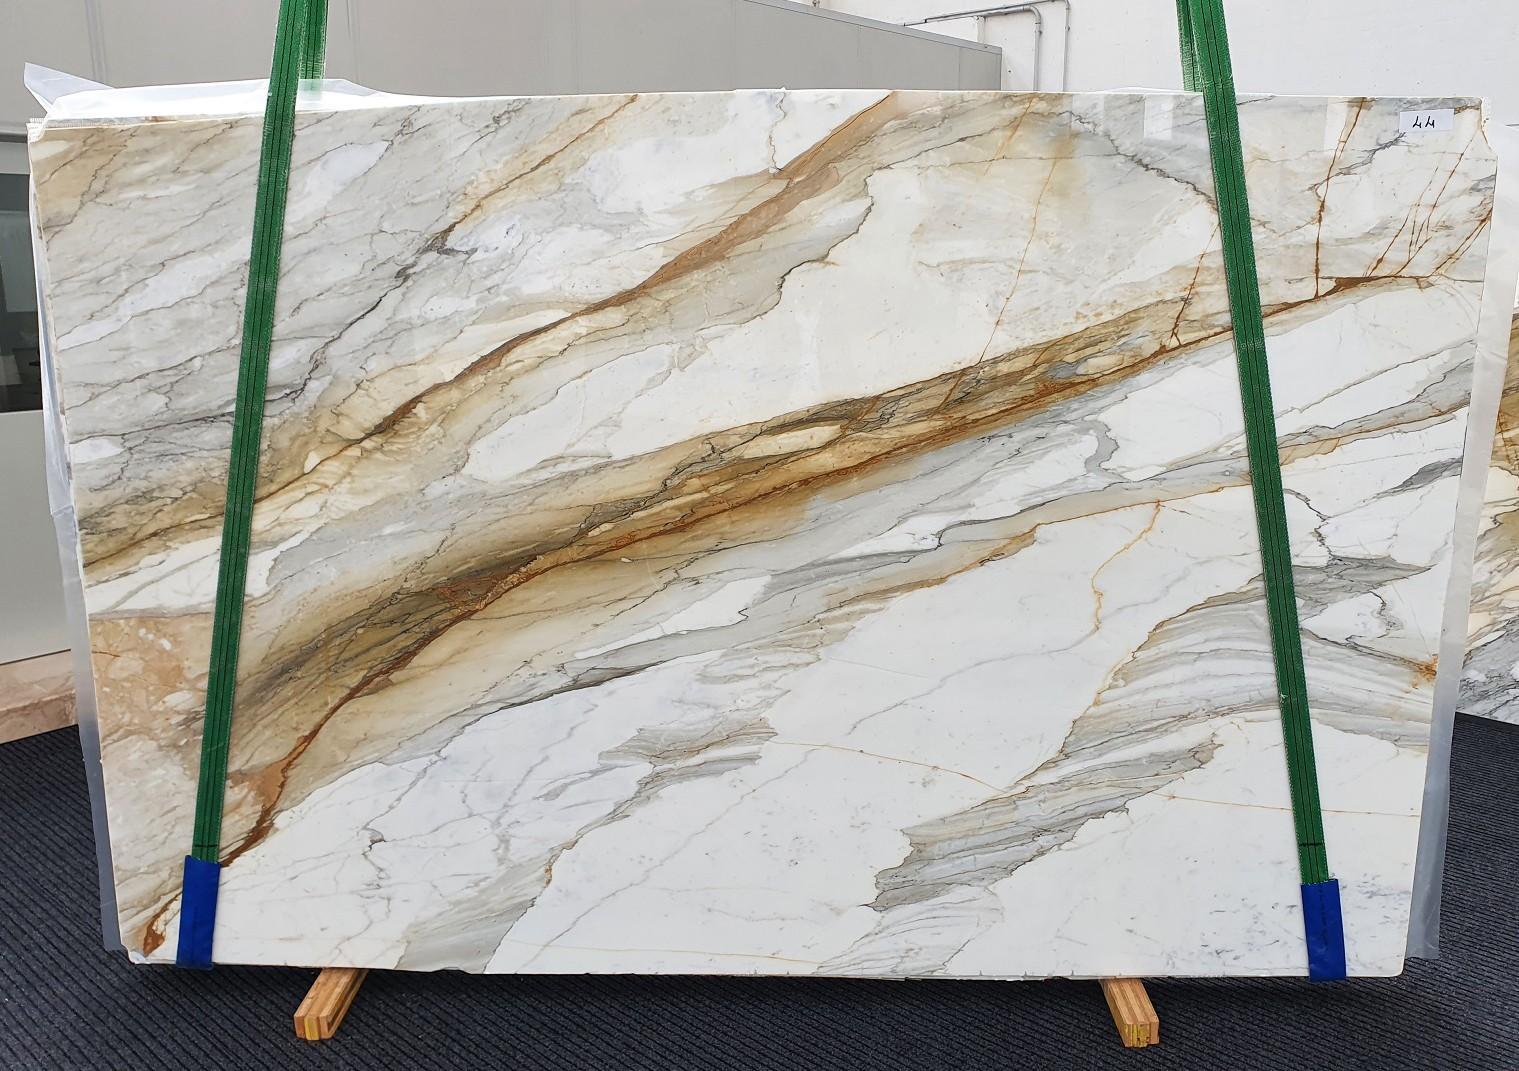 CALACATTA MACCHIAVECCHIA Suministro Veneto (Italia) de planchas pulidas en mármol natural 1354 , Slab #44